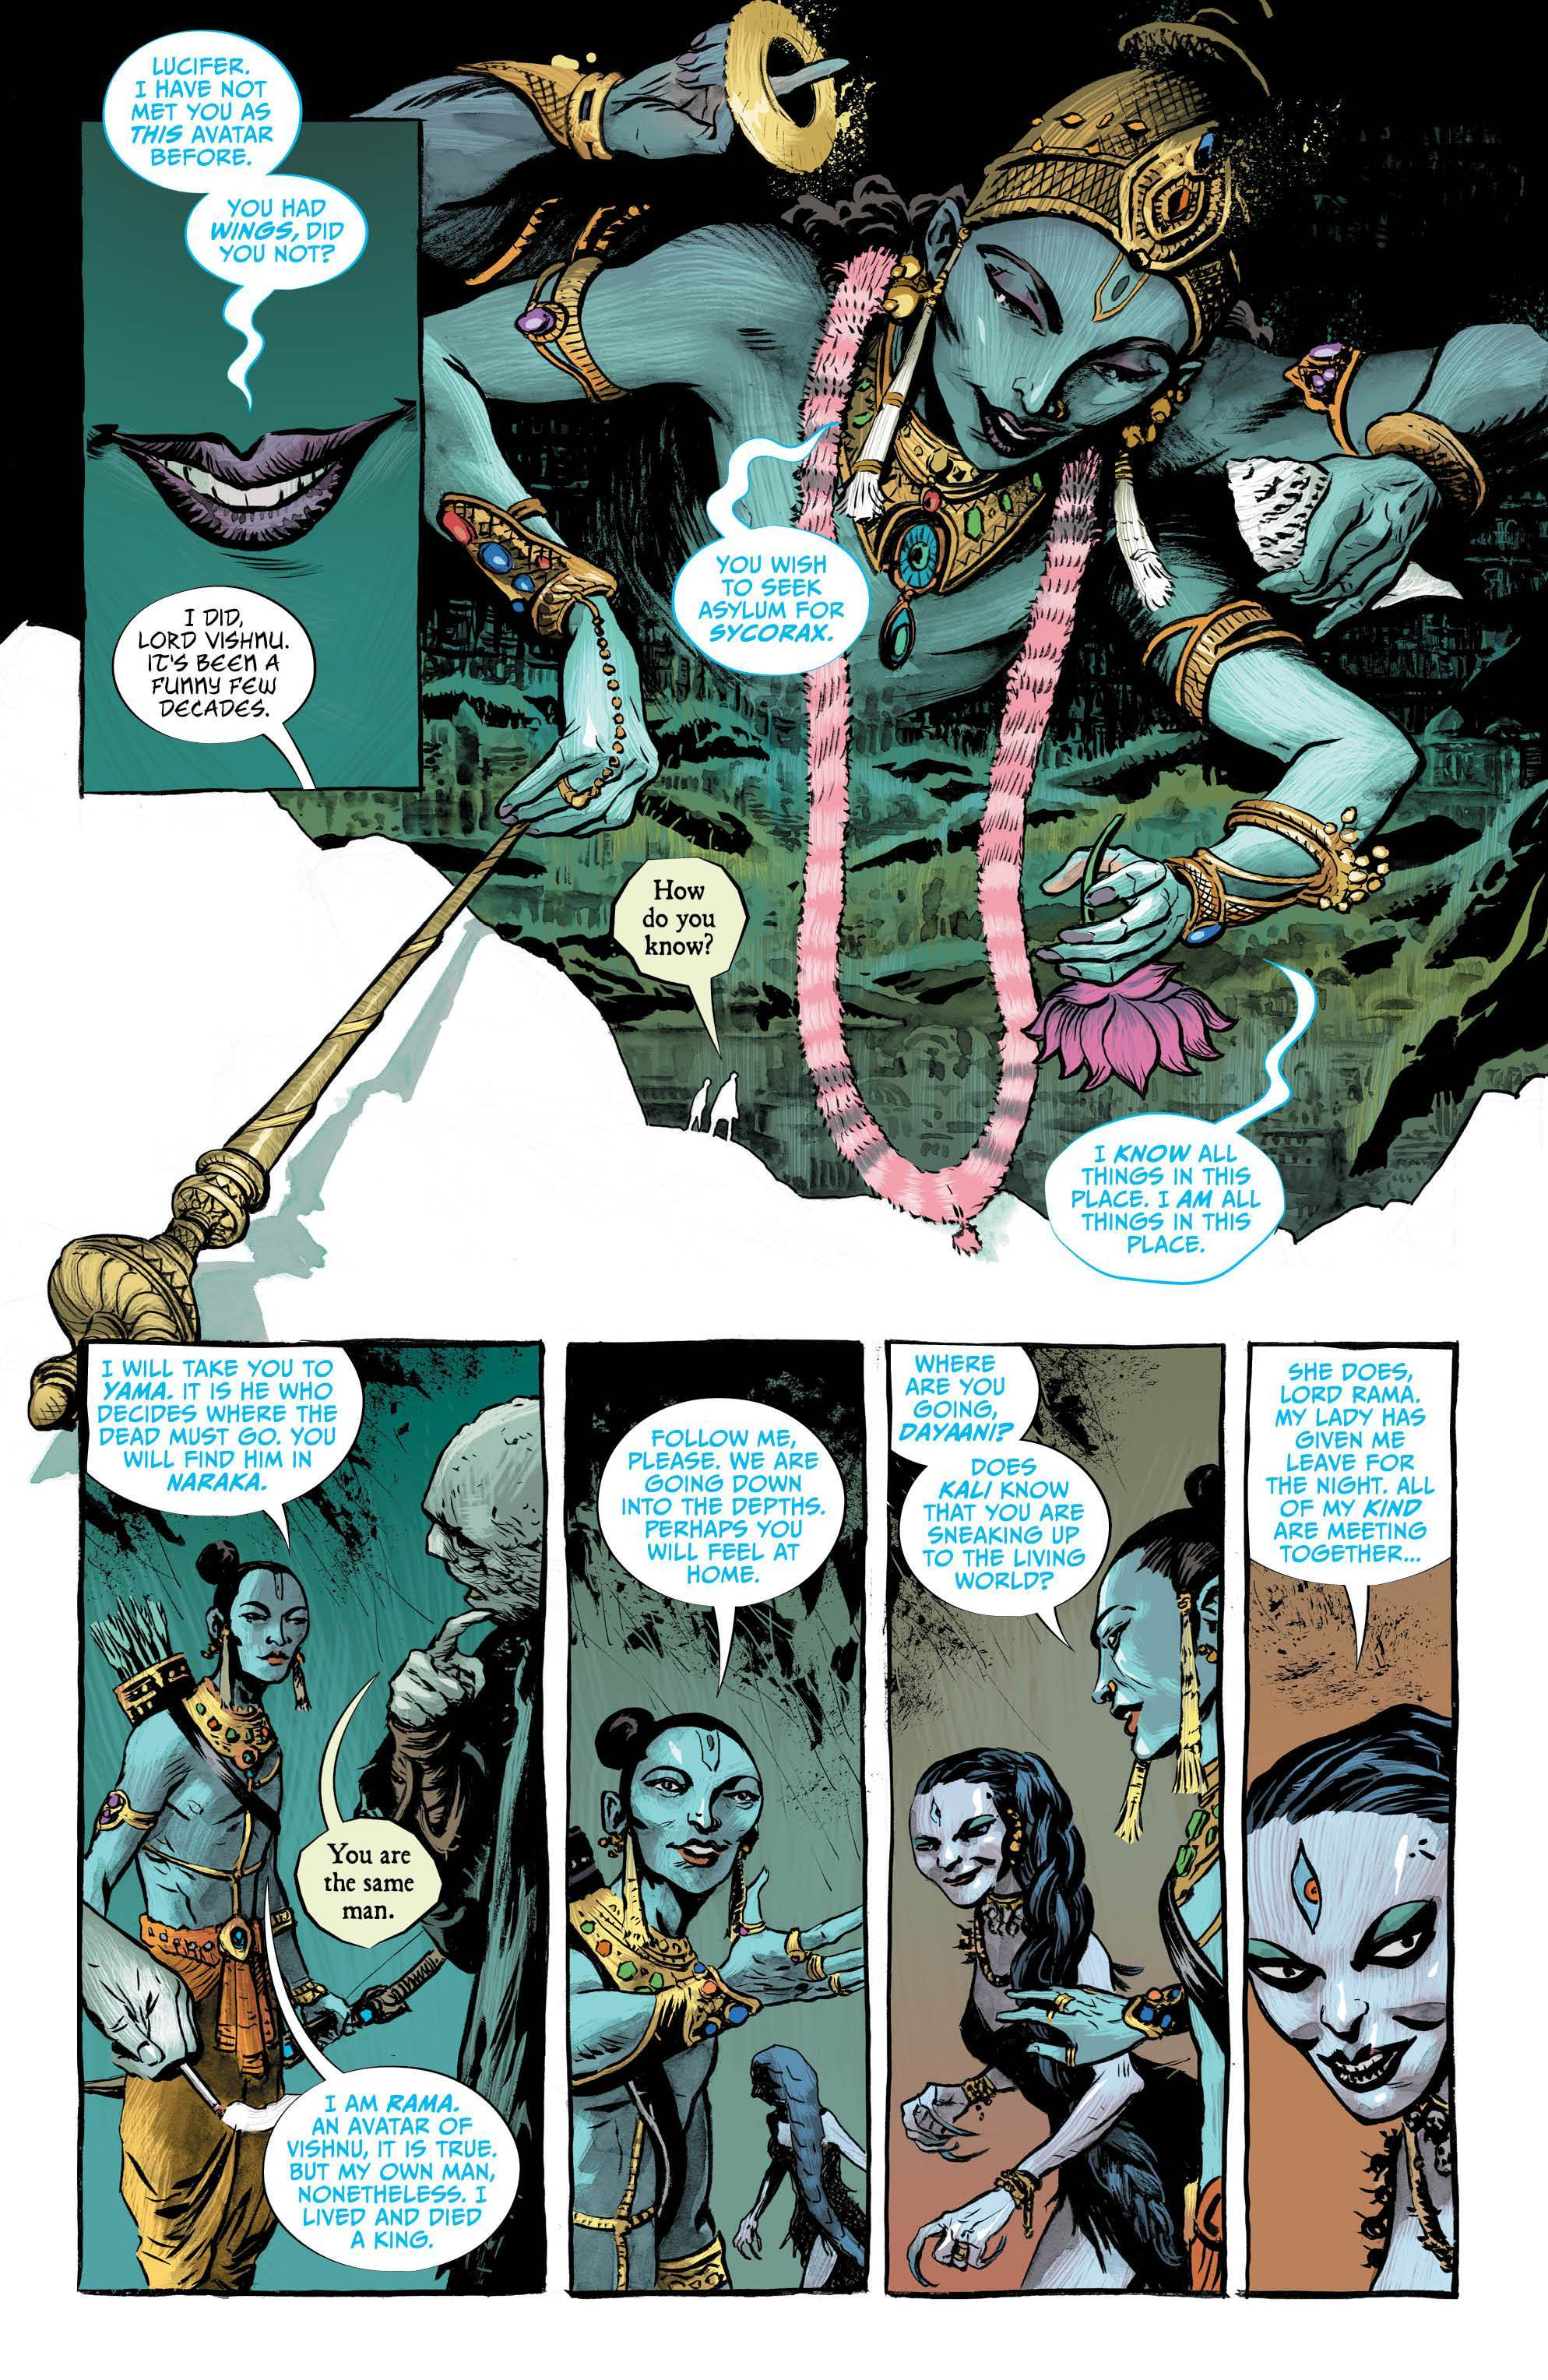 Lucifer #10: Page #5, Lucifer and Caliban talk to Vishnu